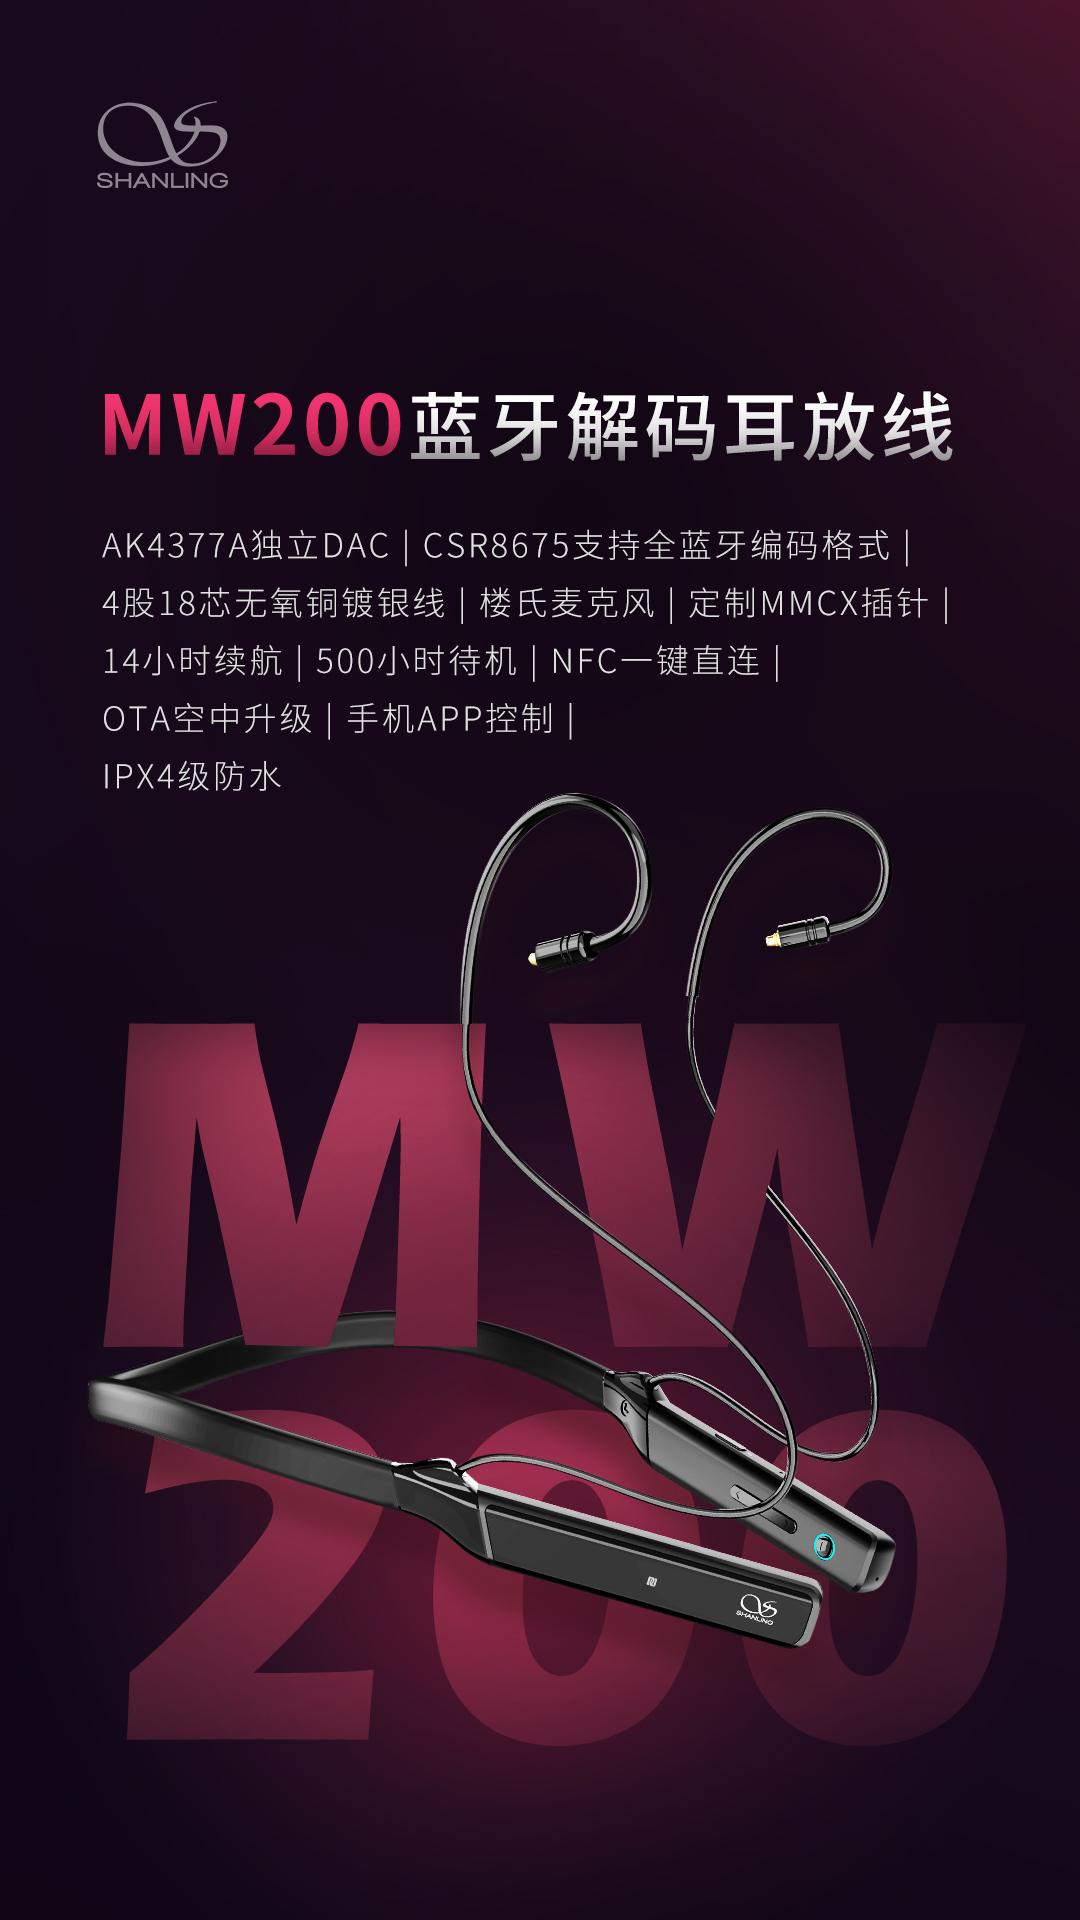 MW200 正式发布.jpg